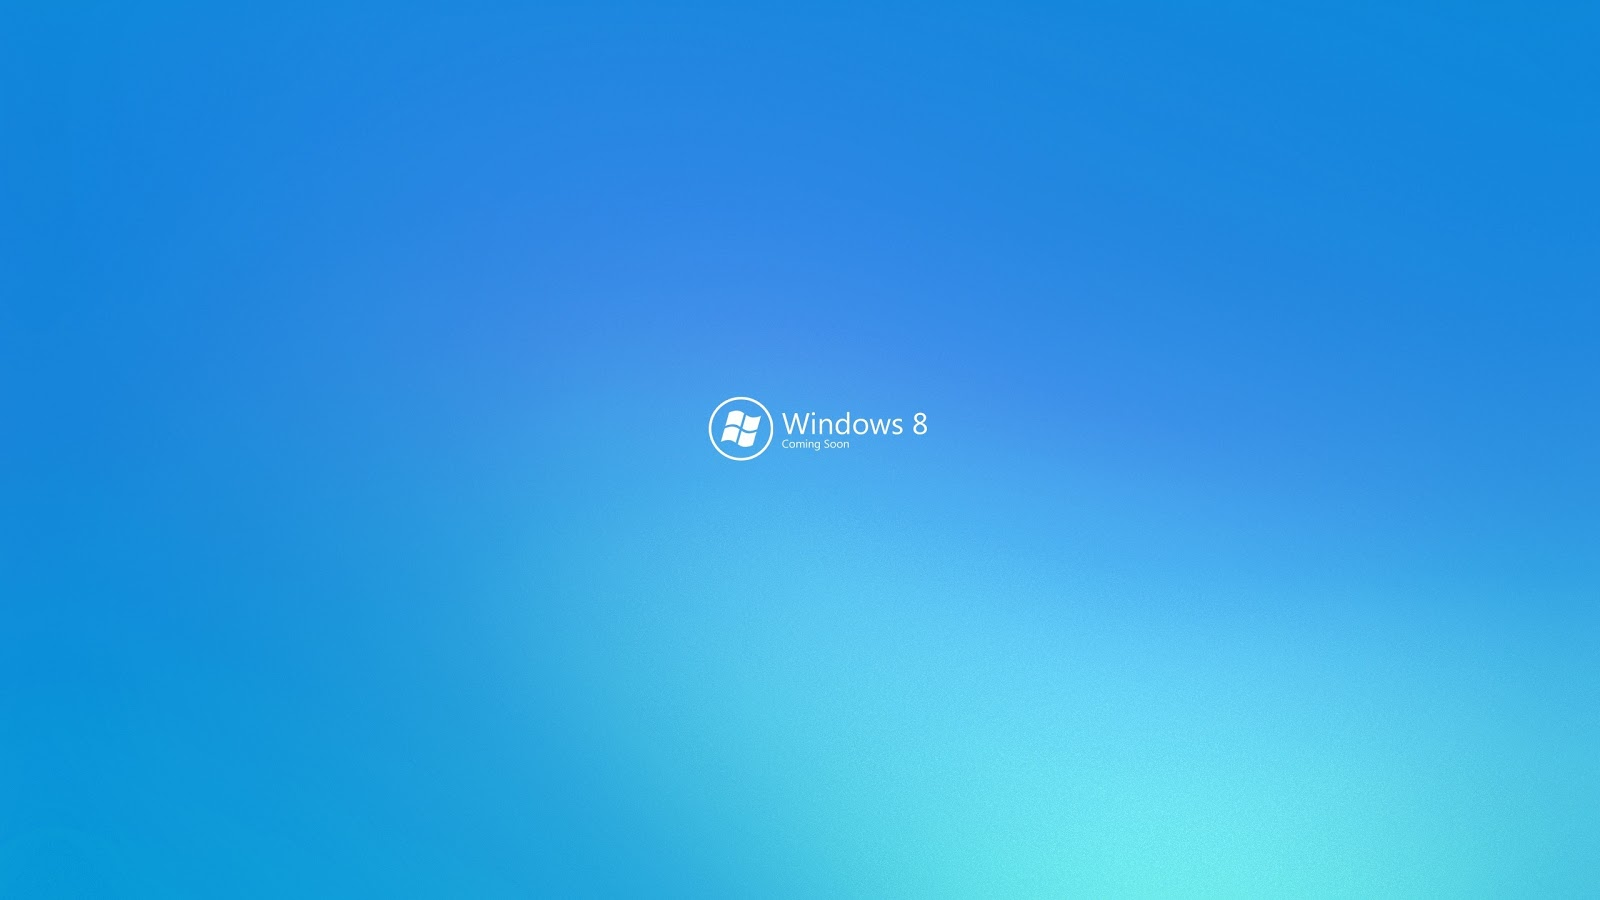 Wallpaper Windows 8  № 1929032 без смс